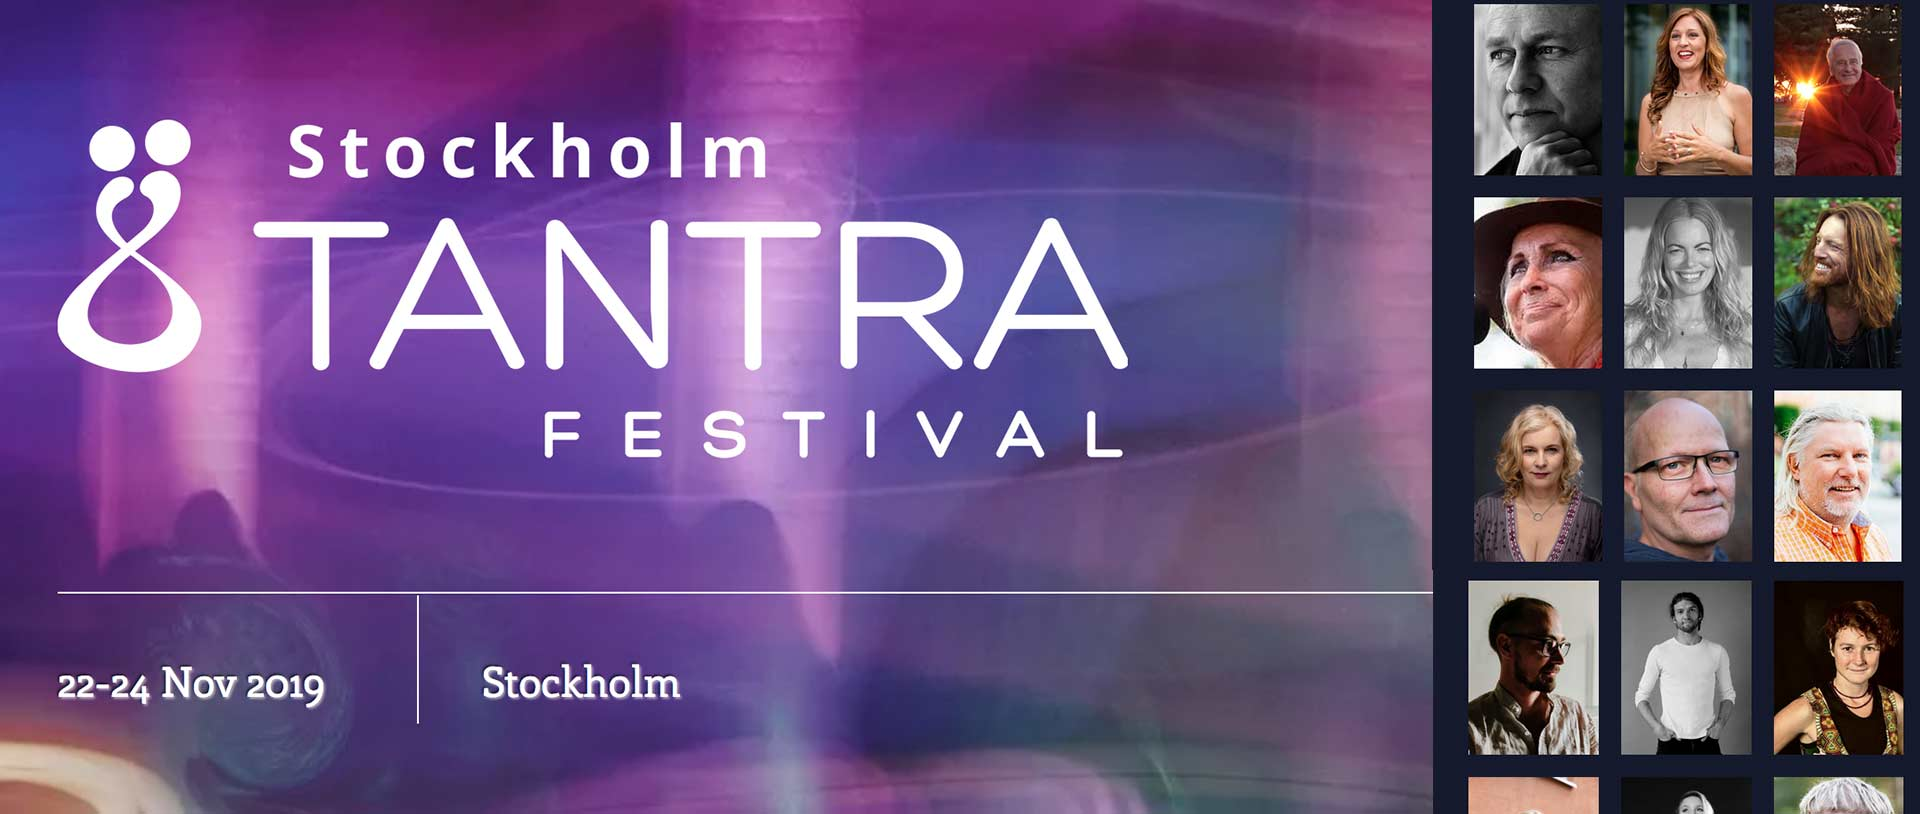 Stocholm Tantra Festival